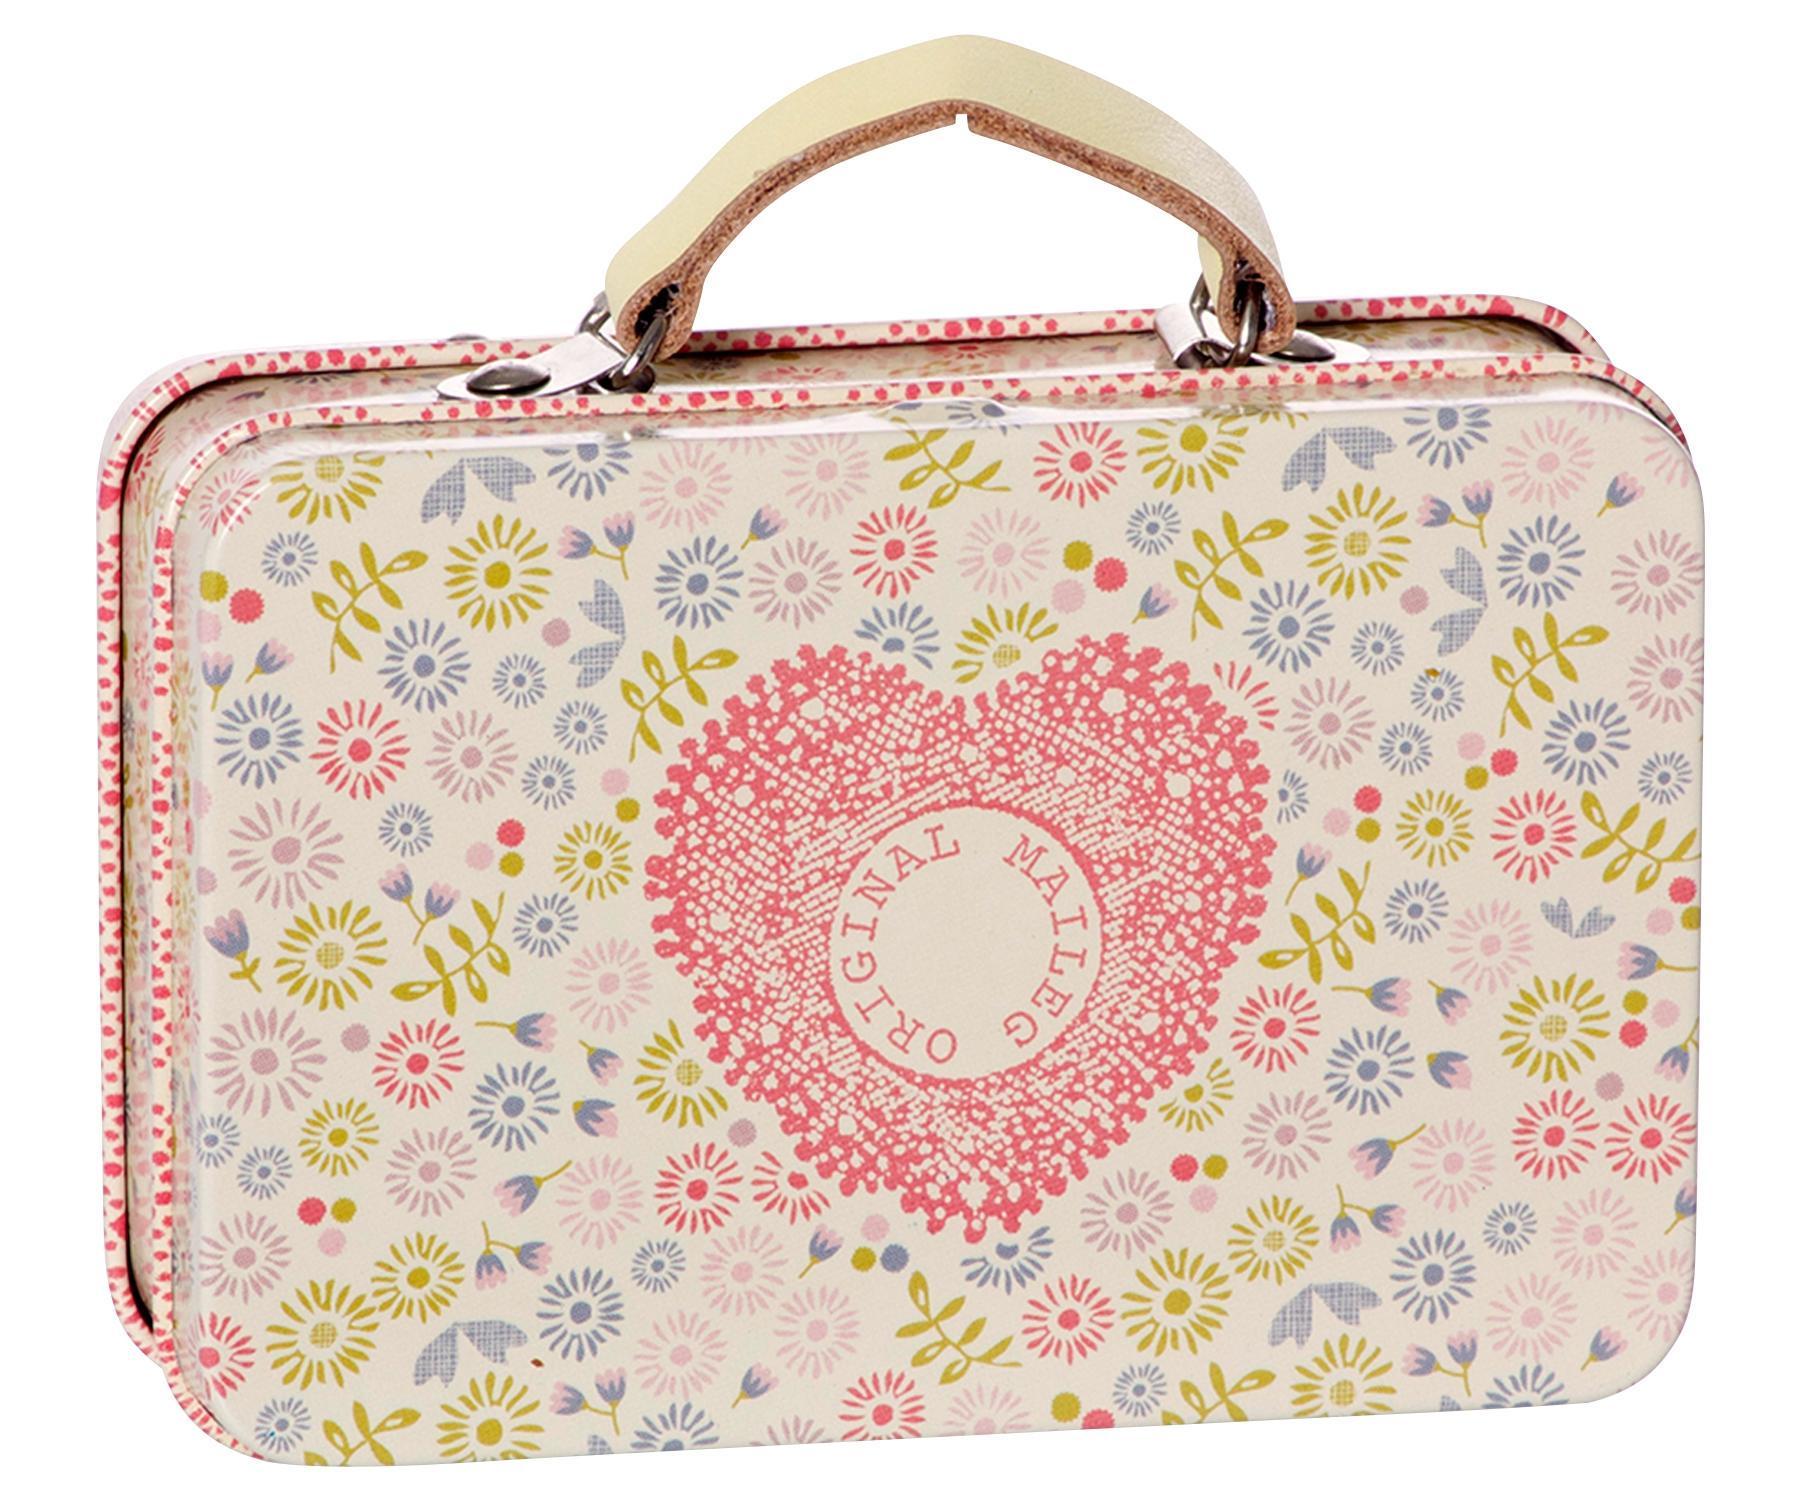 Maileg Plechový mini kufřík Flower, béžová barva, multi barva, kov